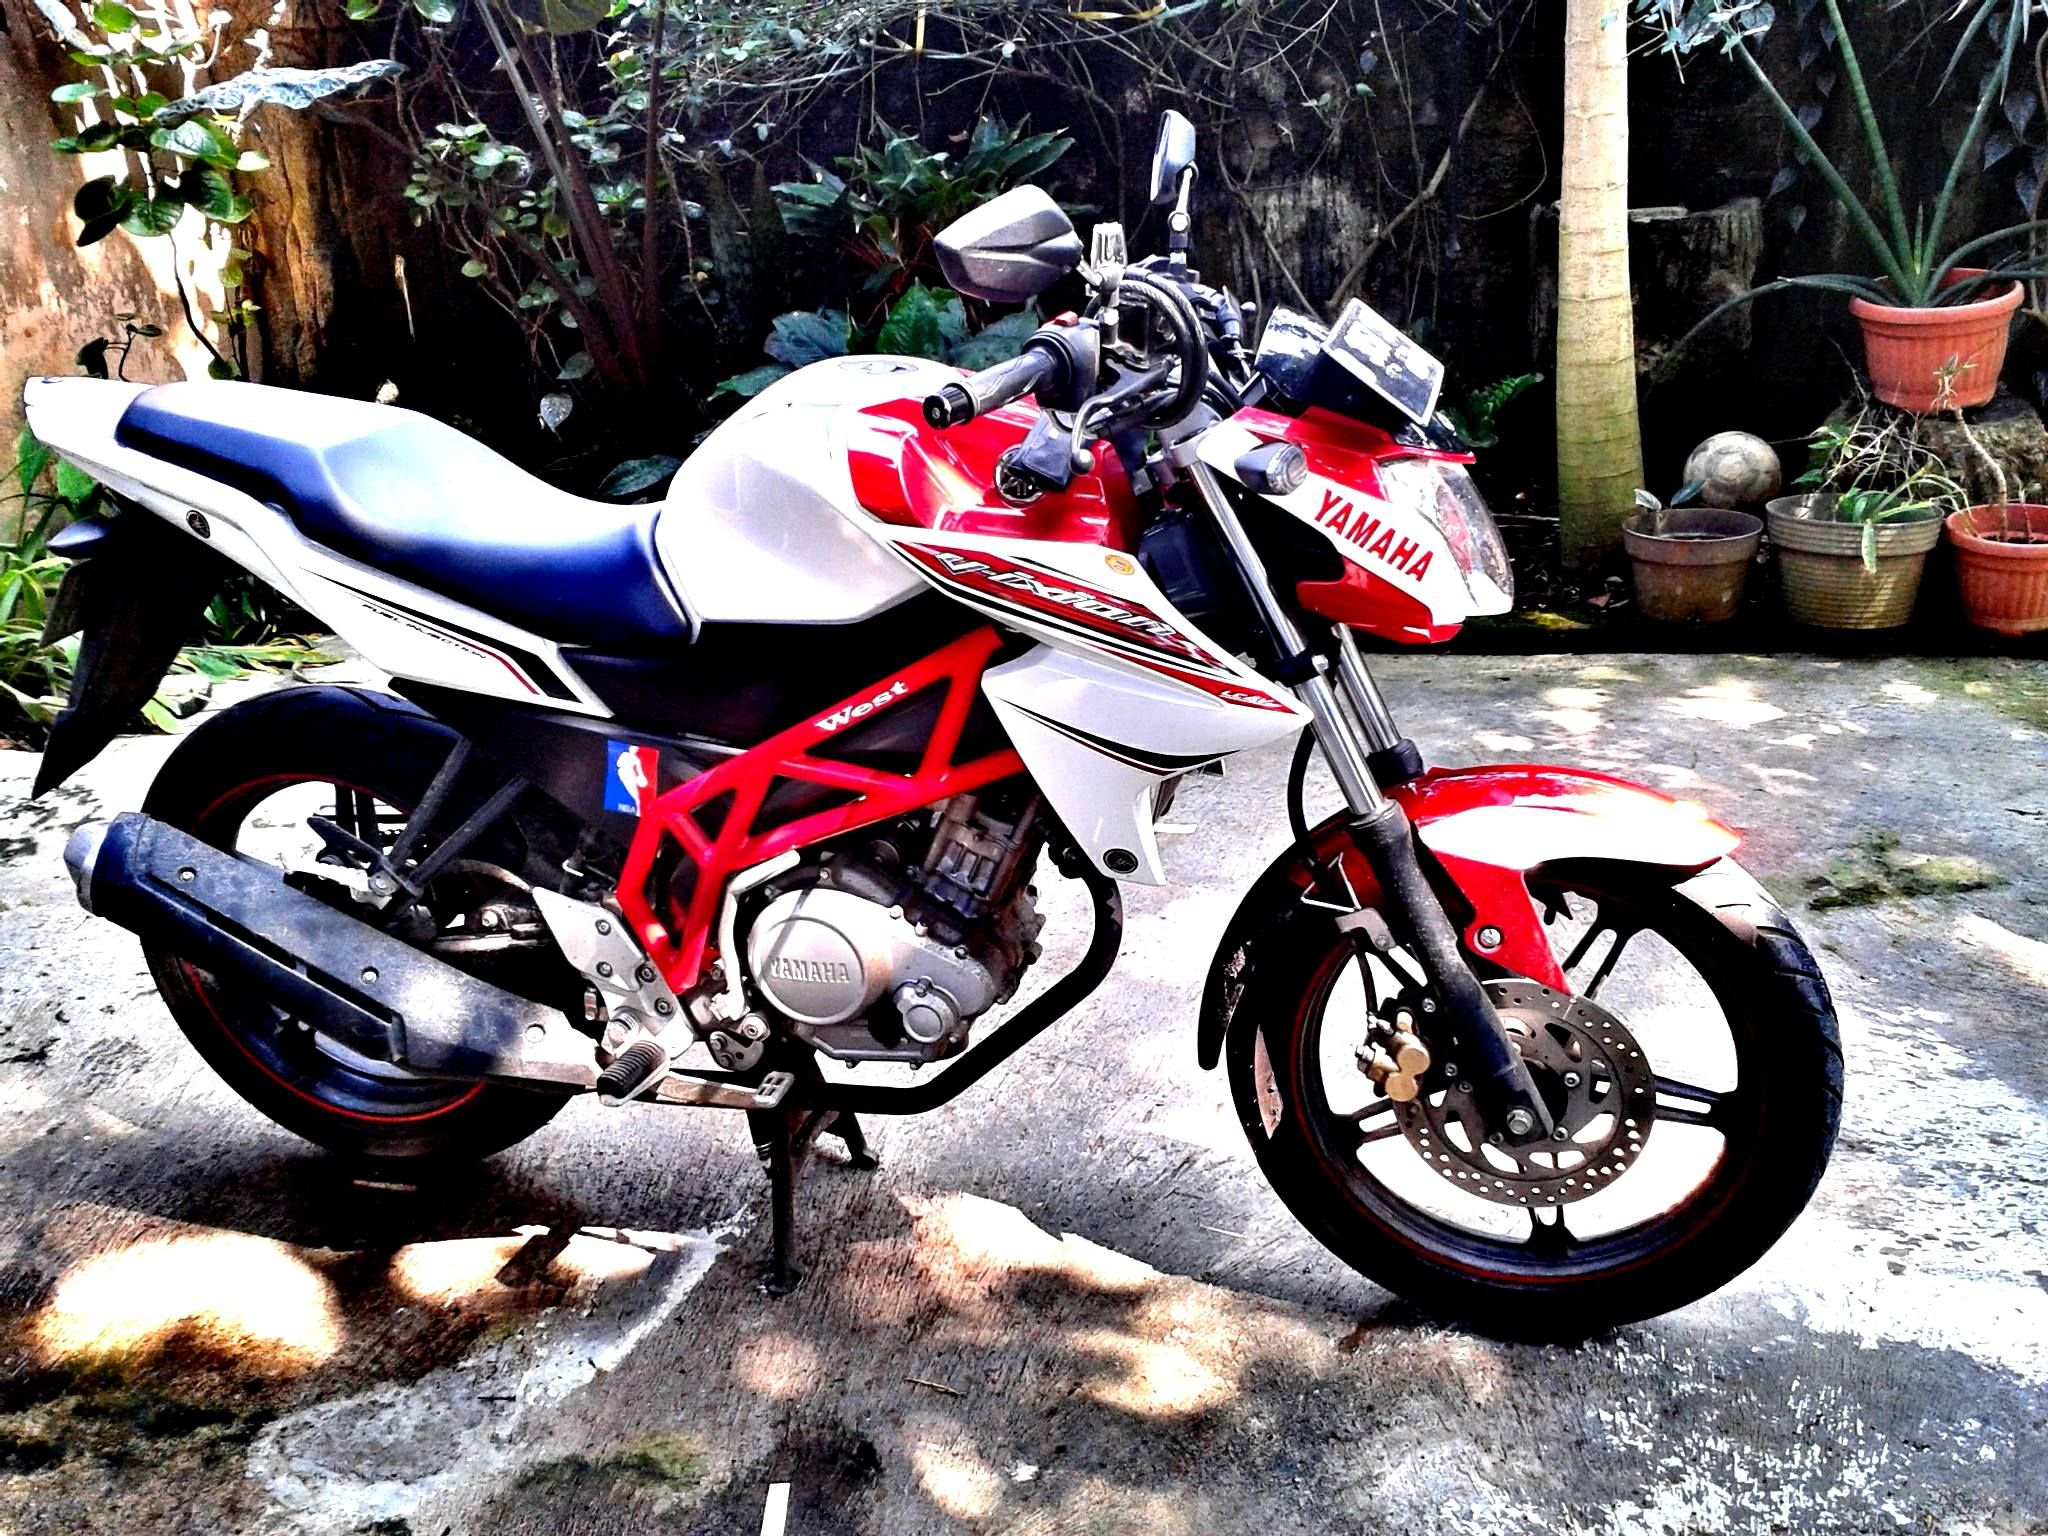 Modifikasi Motor Yamaha New Vixion Paling Keren 2016 Motor